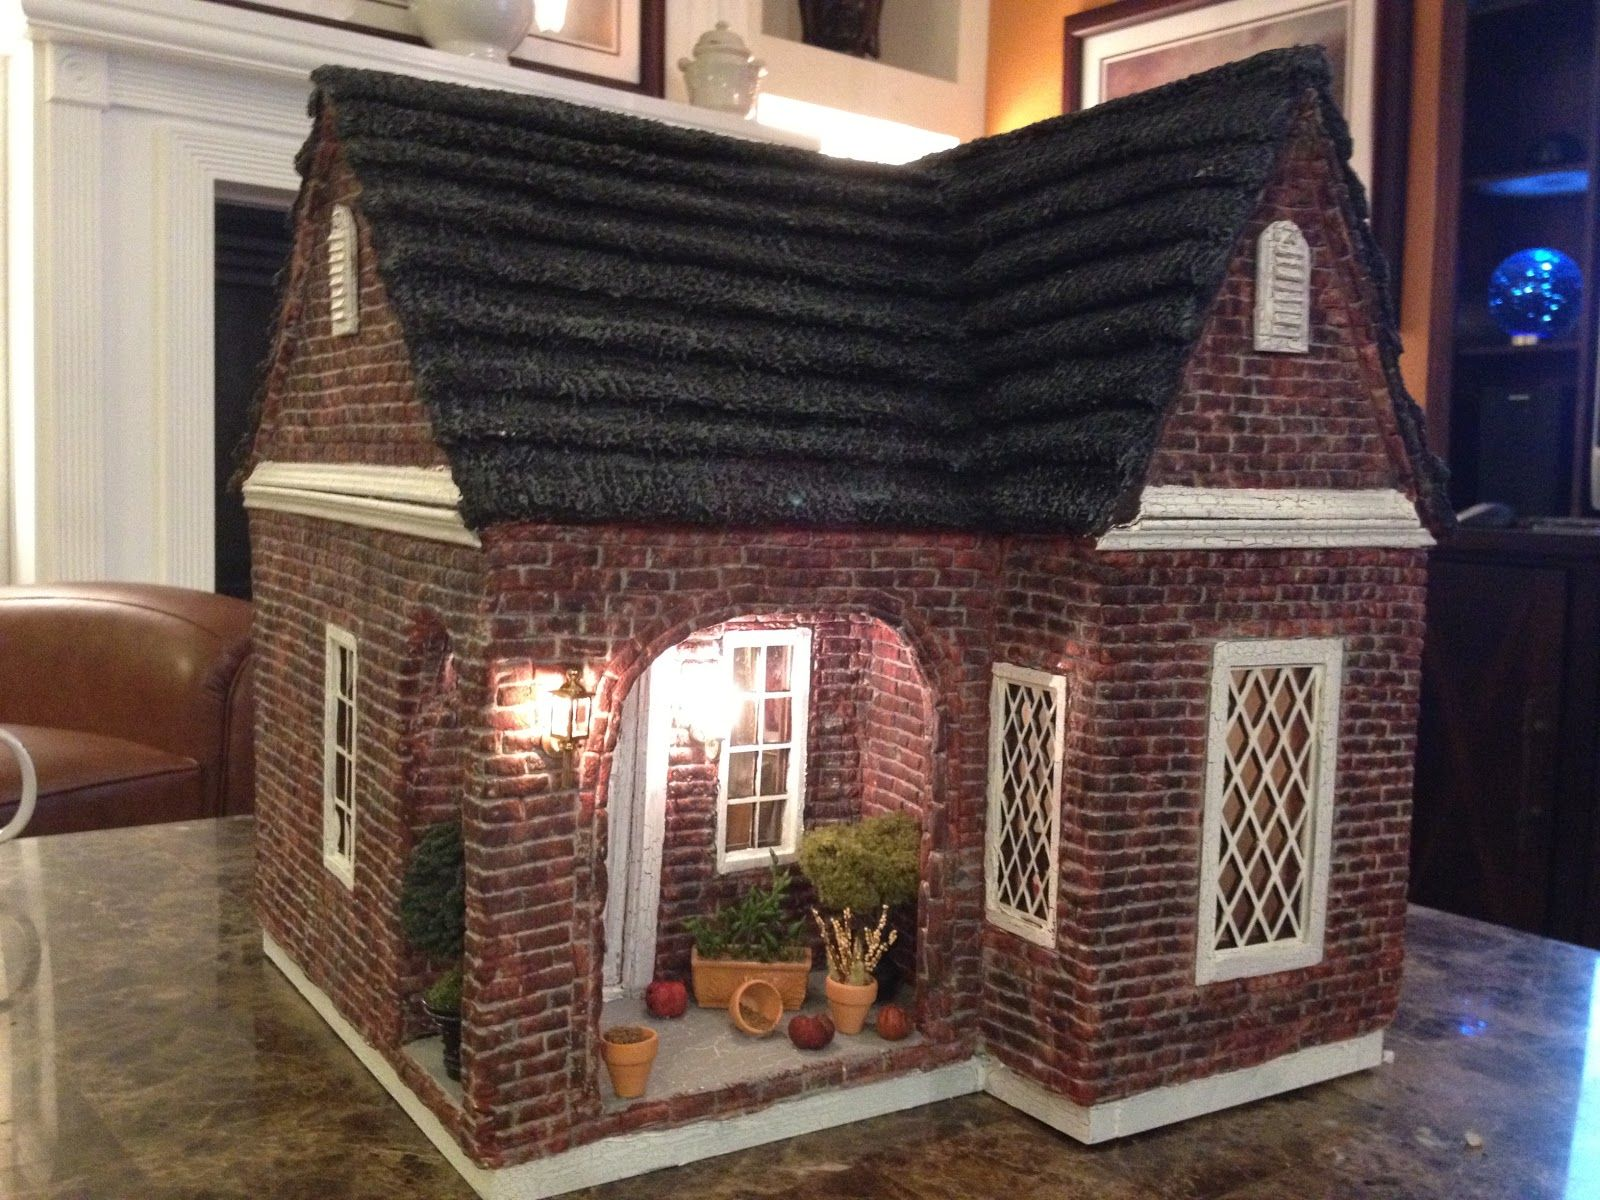 wie macht man ein miniatur haus aus papier google suche glitter house christmas house. Black Bedroom Furniture Sets. Home Design Ideas